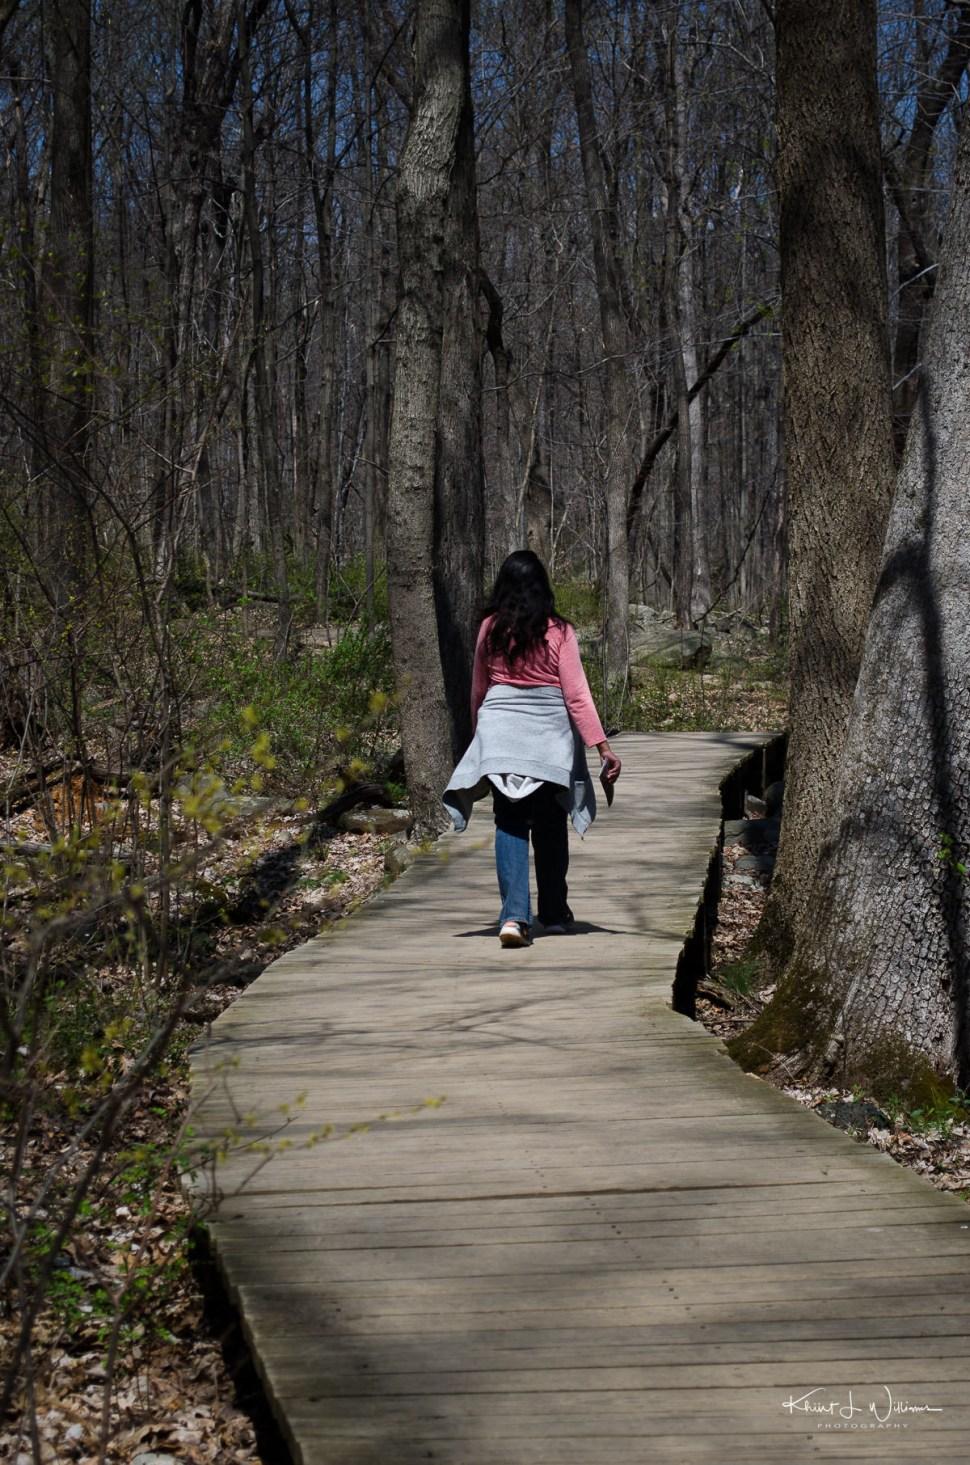 bhavna, board walk, sourland mountain